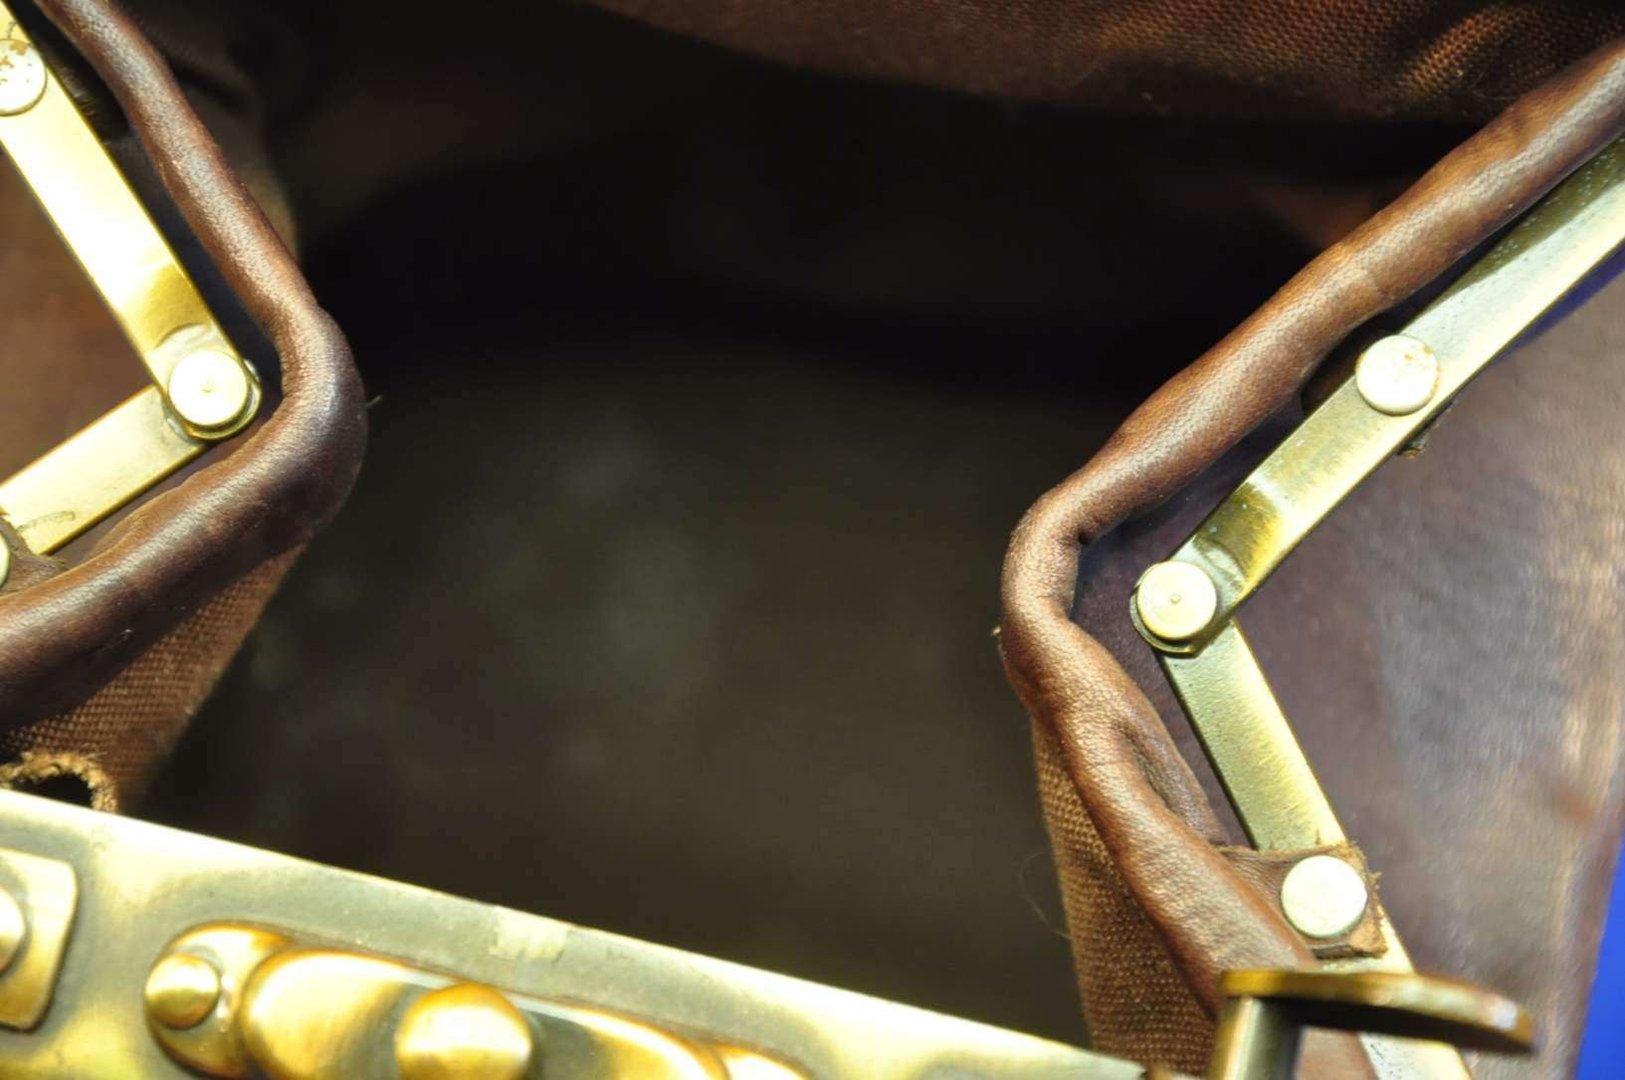 bcb172ed7ed51 Eckige Handtasche robustes Leder Ziehharmonika Tasche - KuSeRa